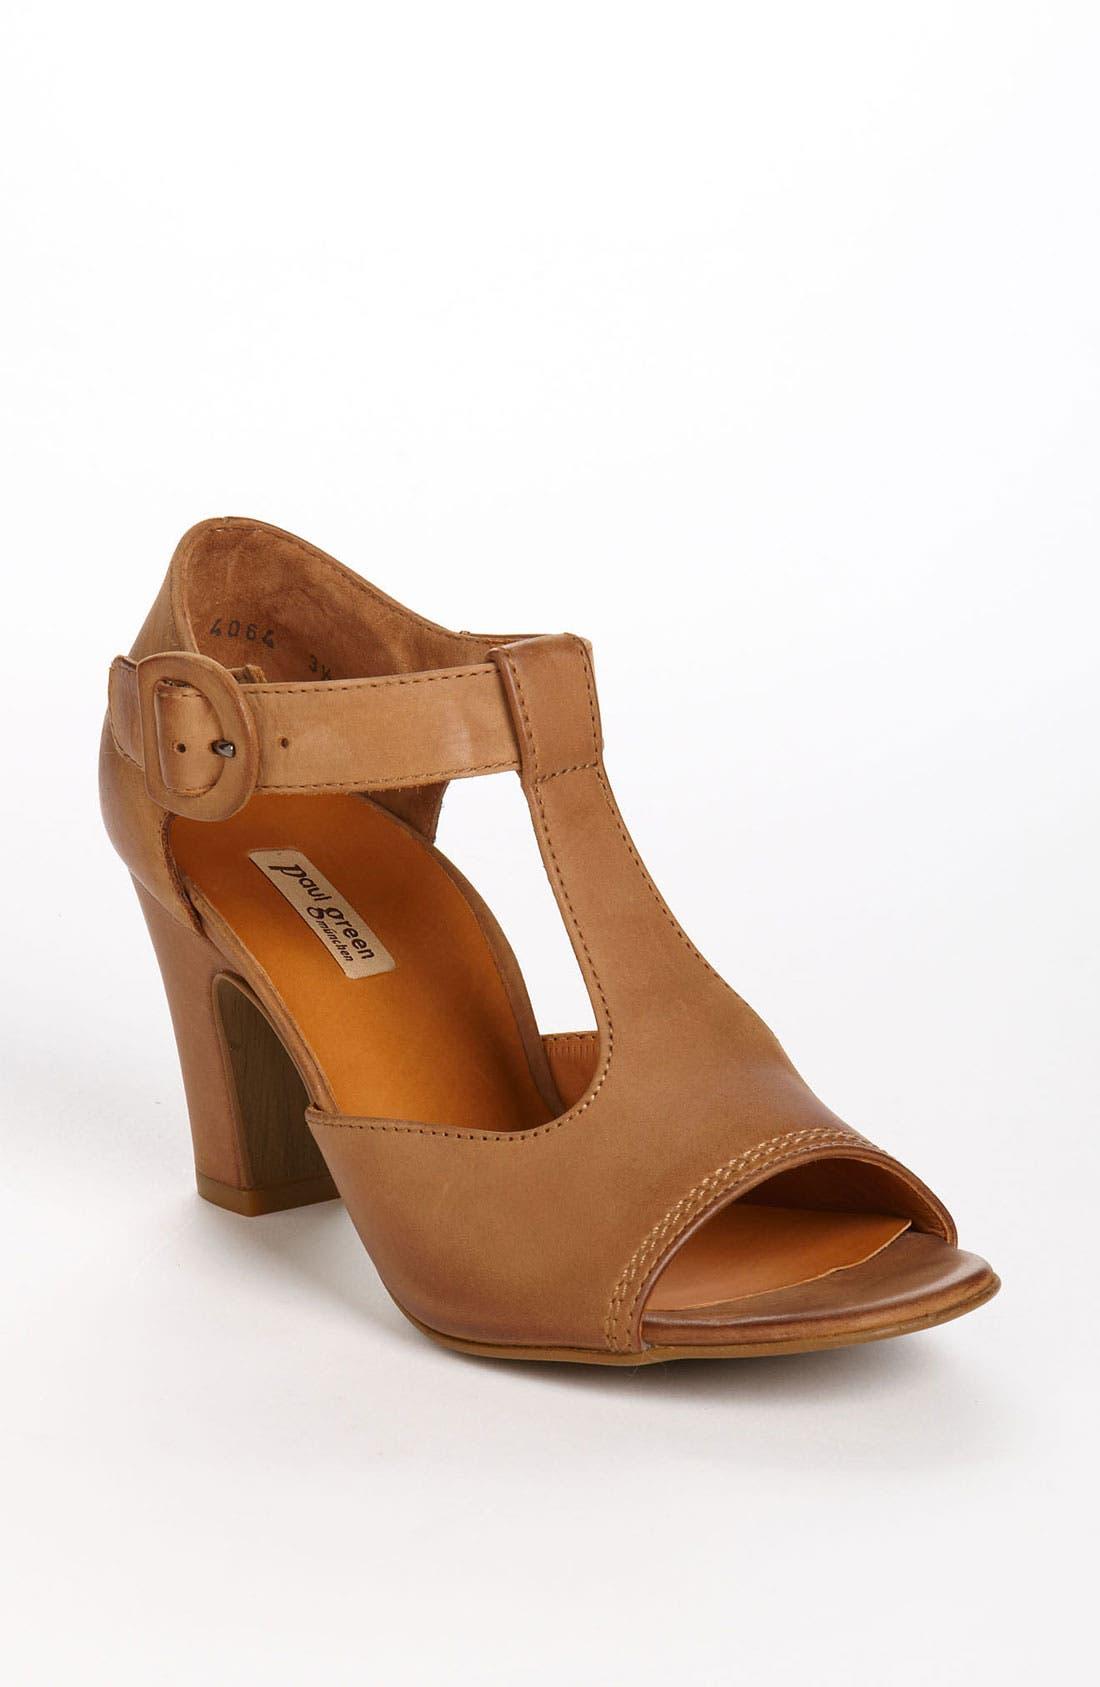 Main Image - Paul Green 'Nines' Sandal